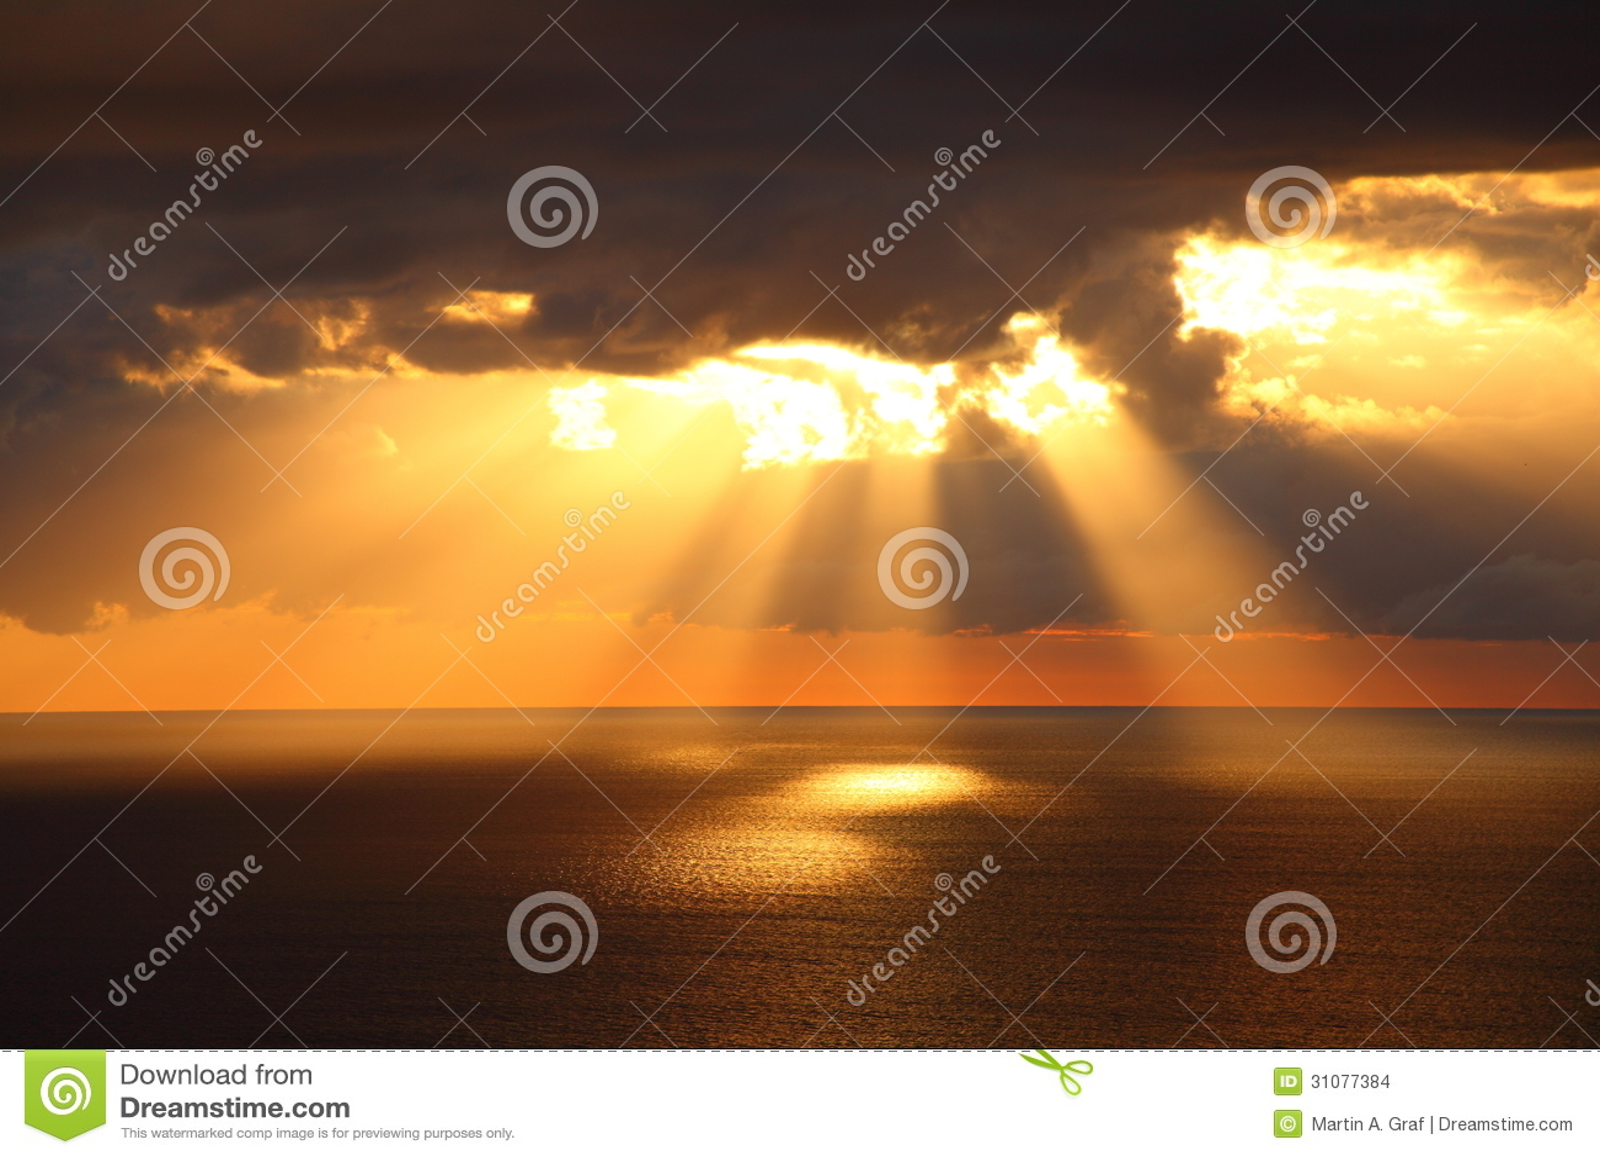 Sunbeams through dark clouds over ocean